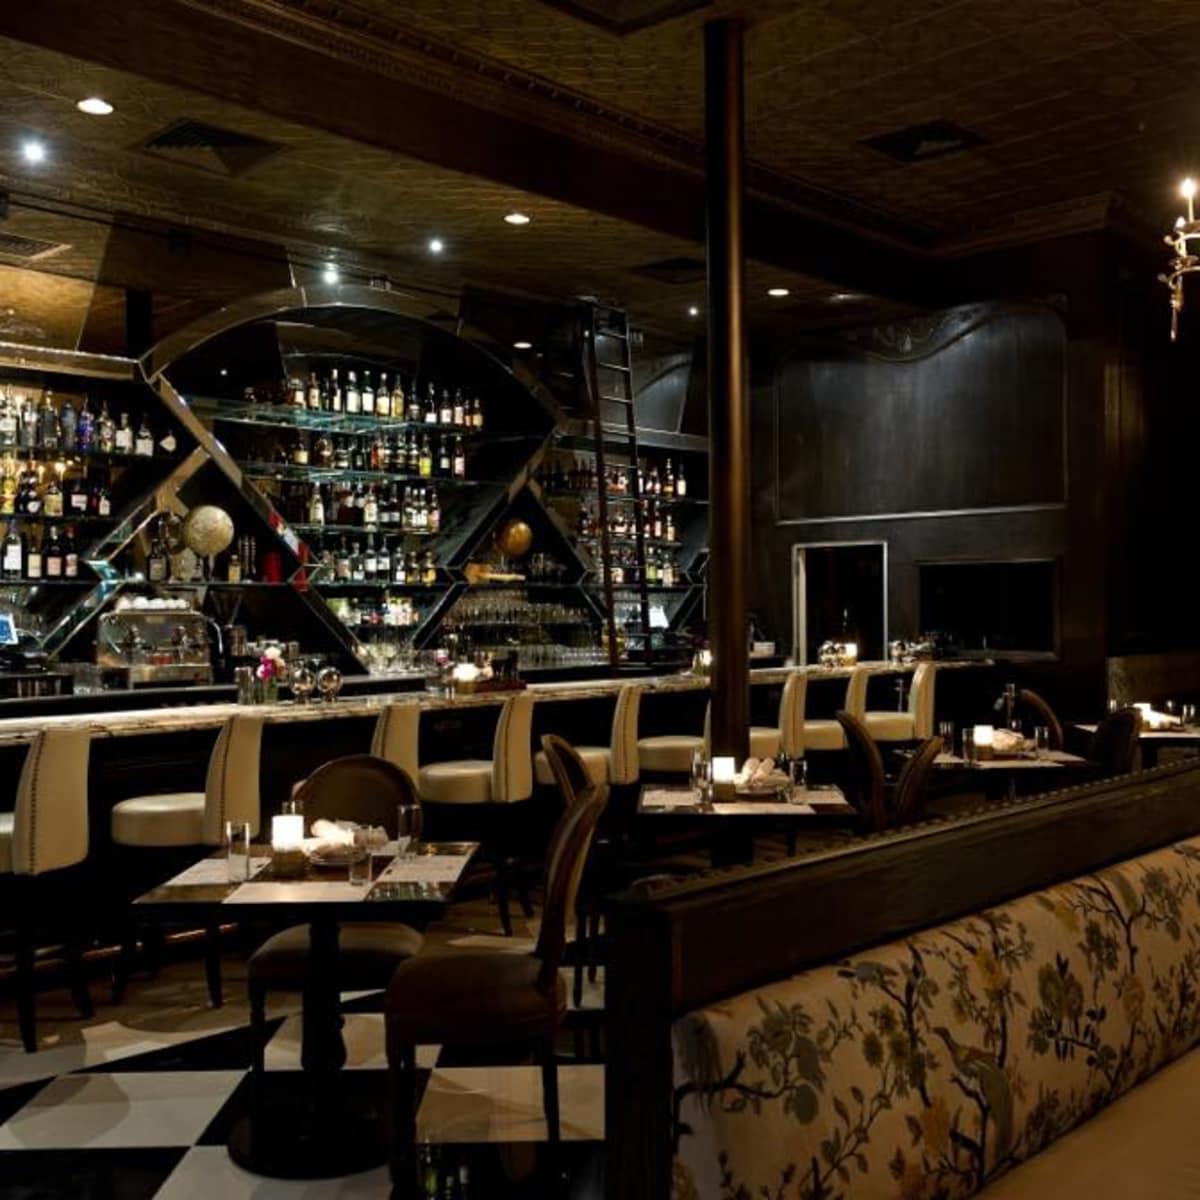 Prohibition Supperclub & Bar interior